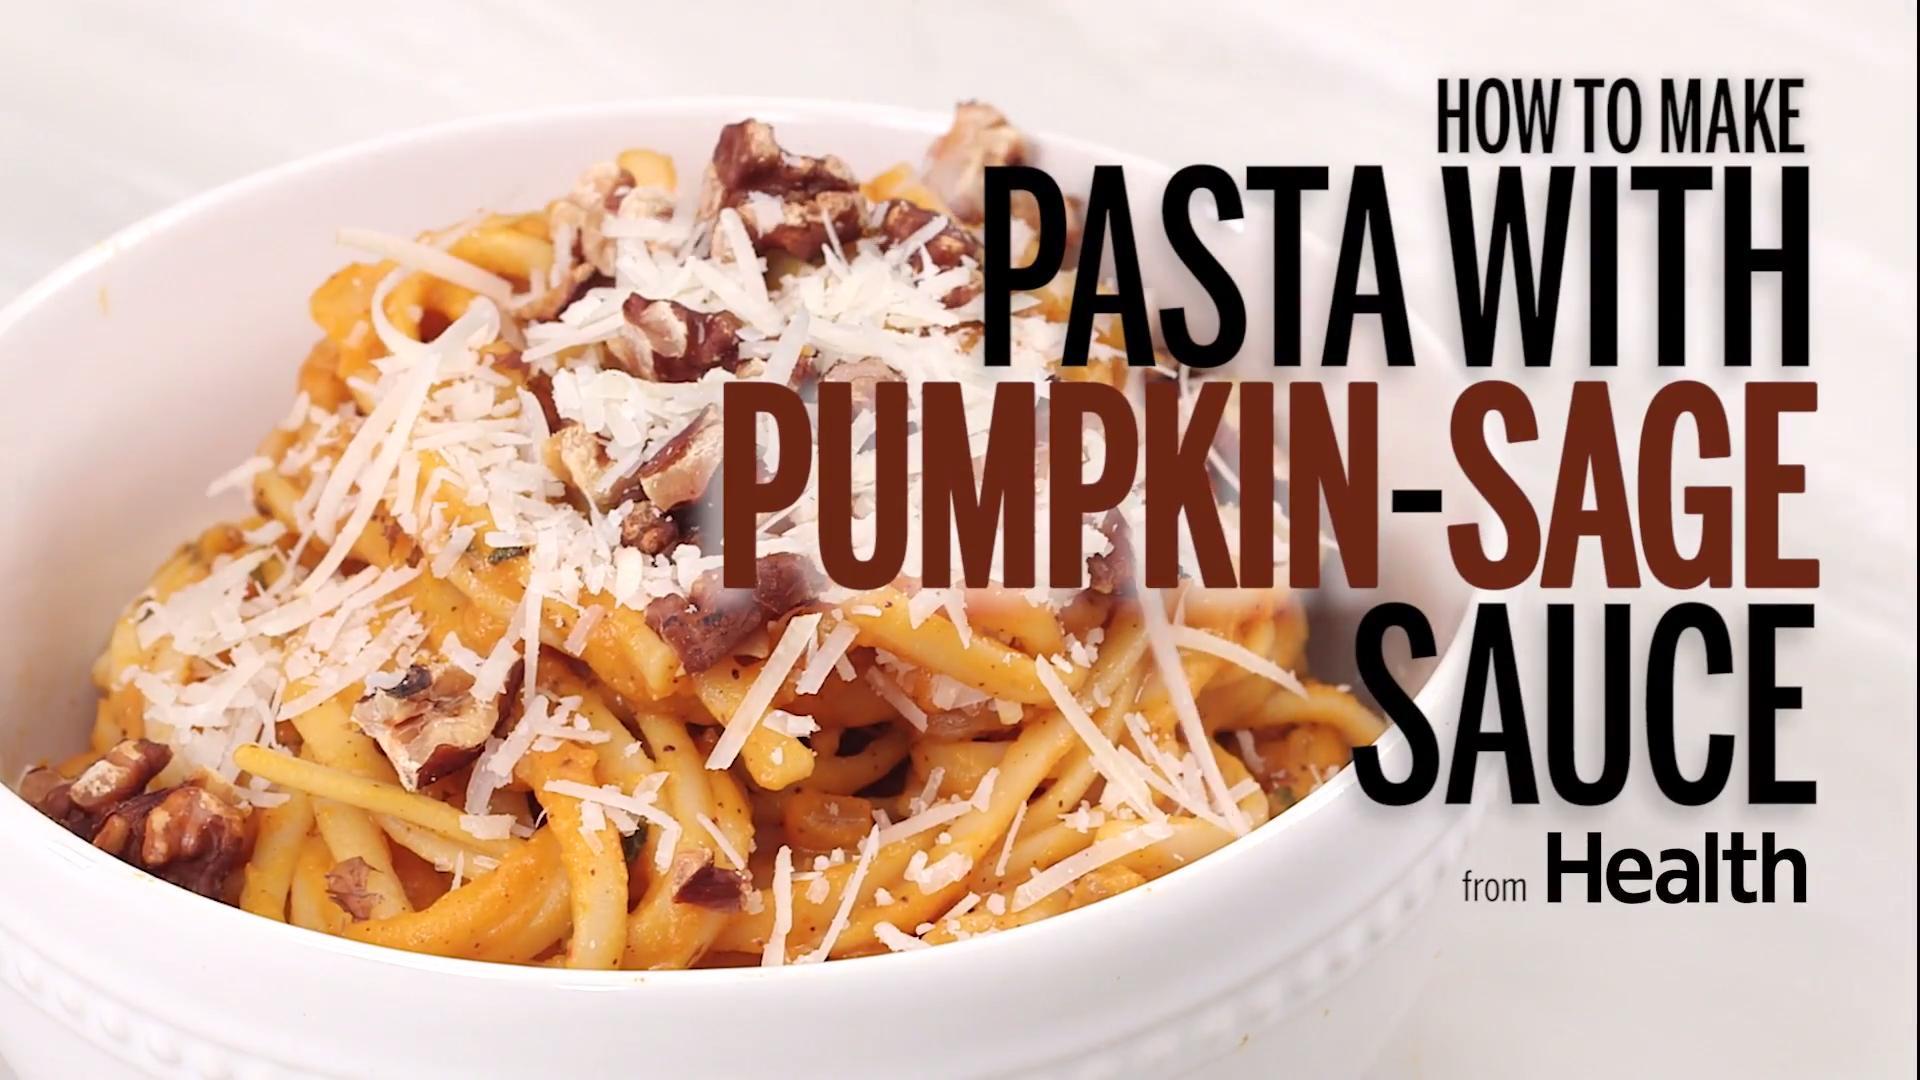 Pasta With Pumpkin Sage Sauce